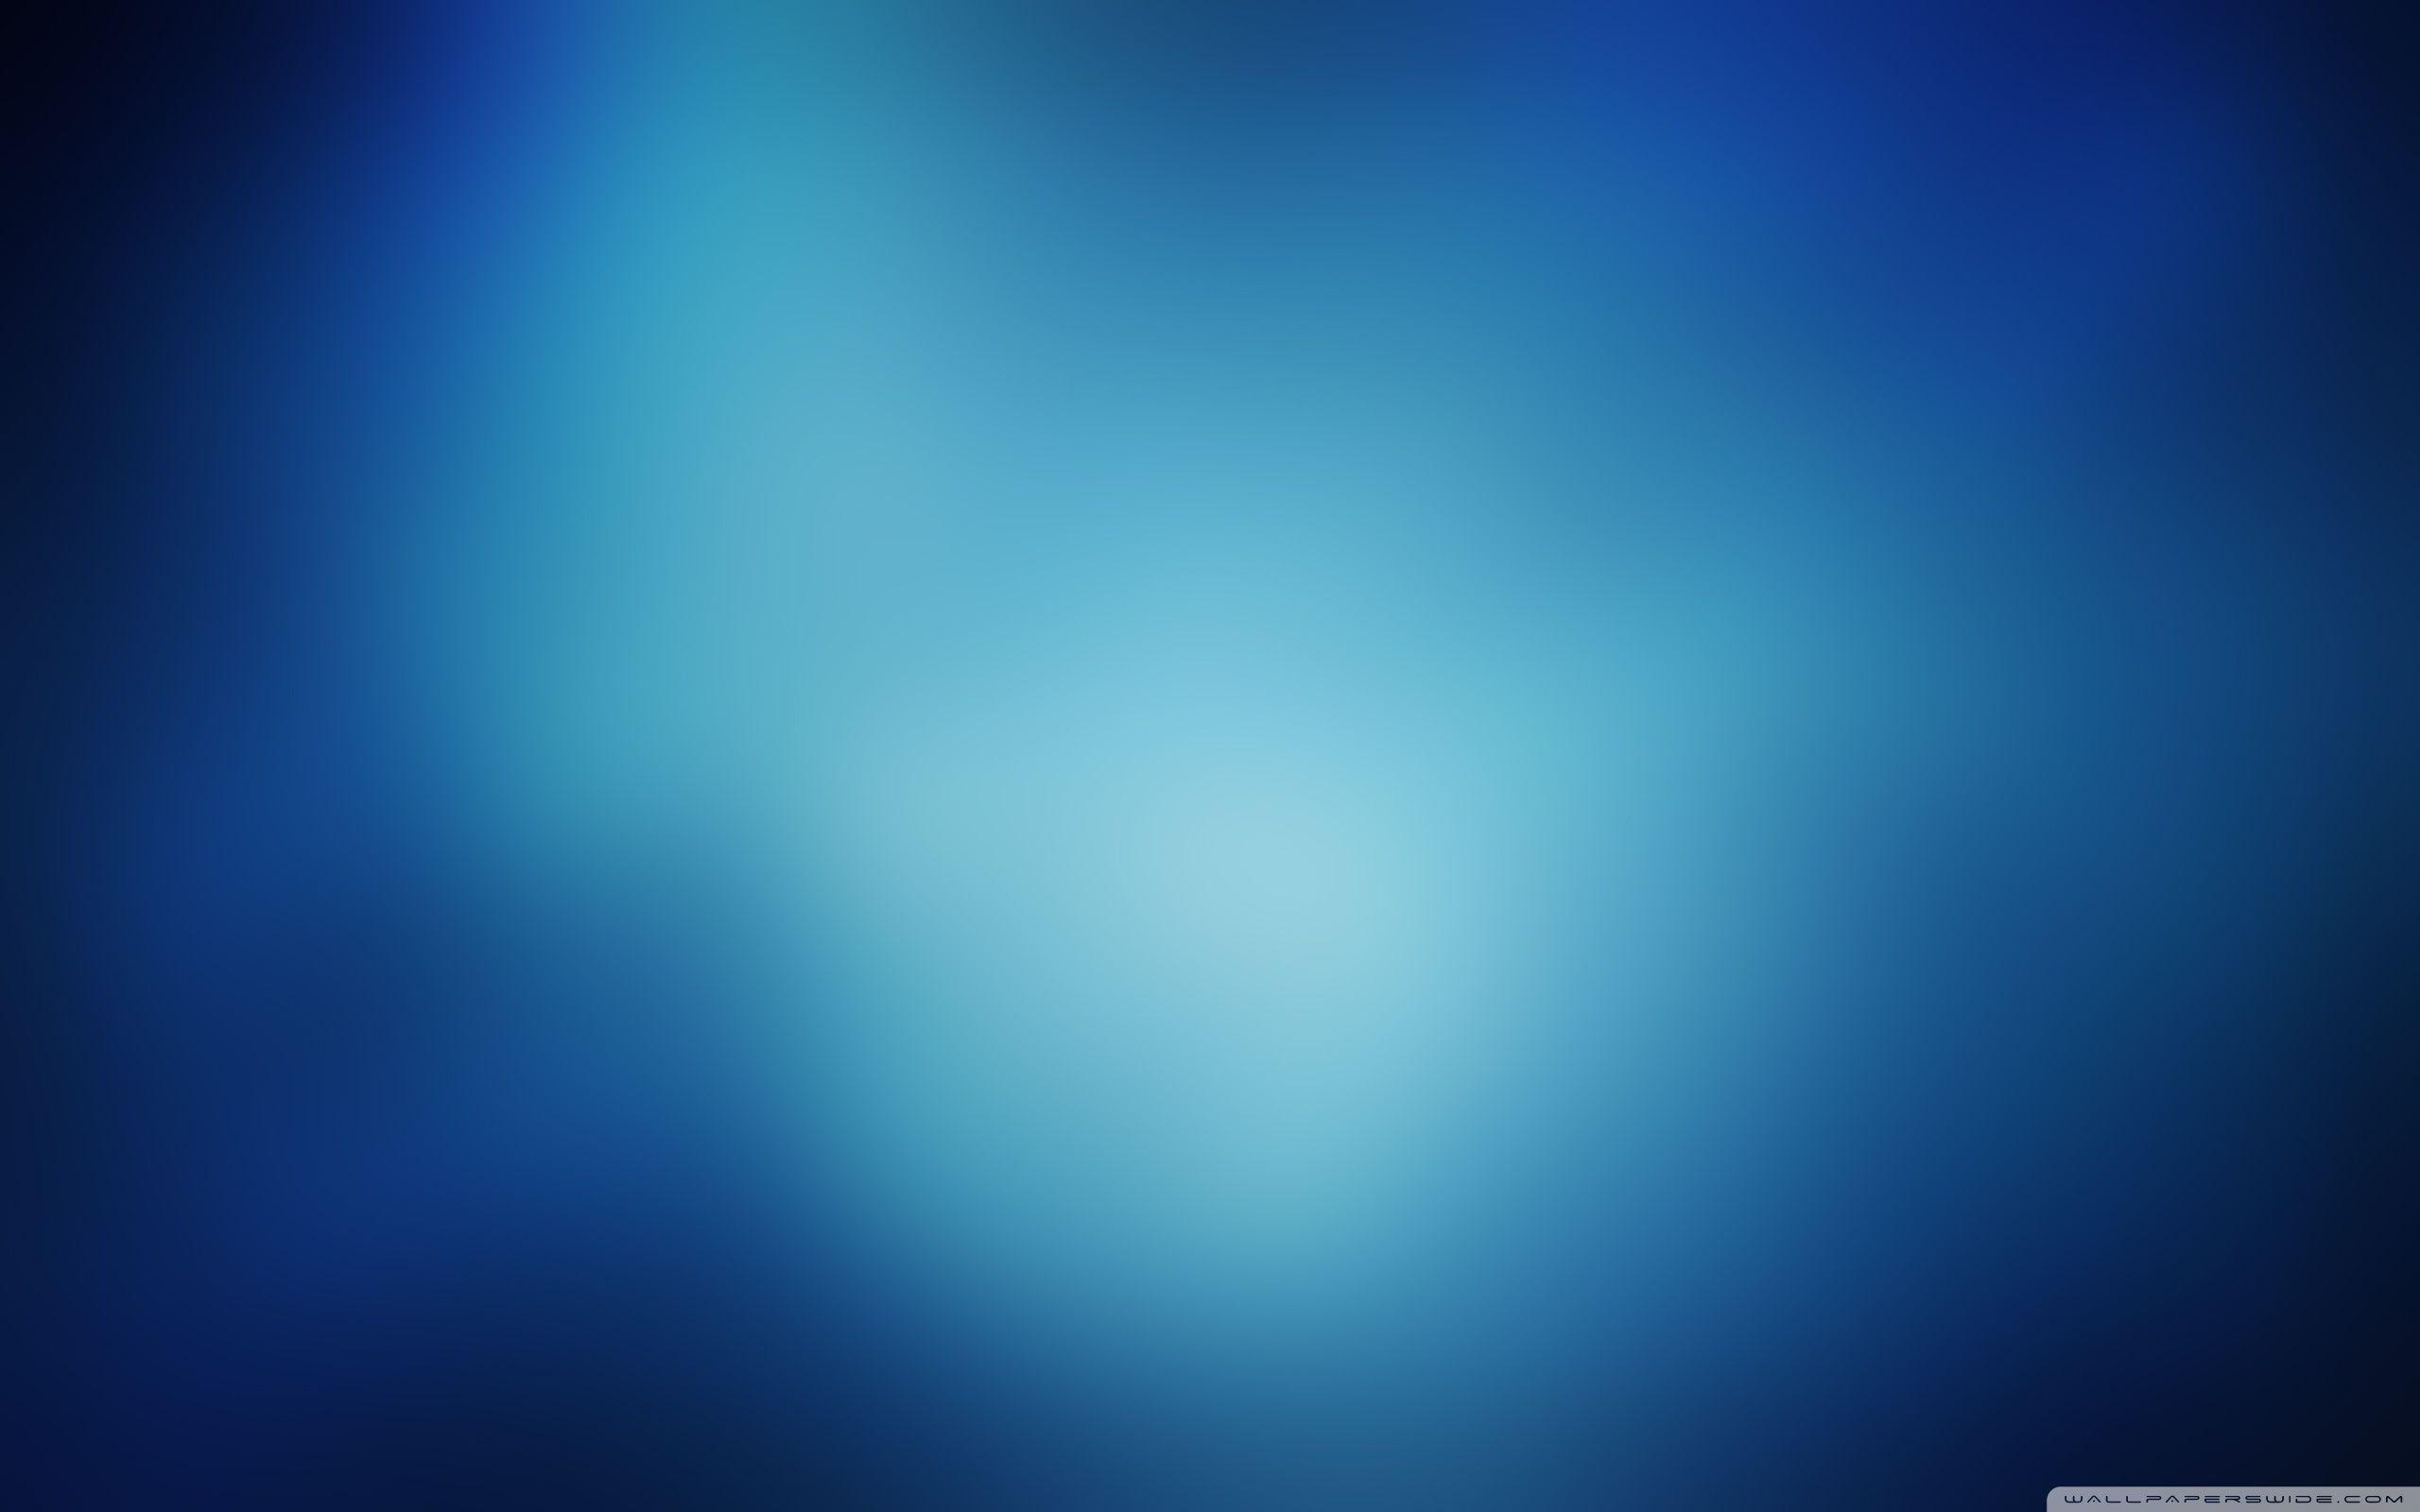 cool Blue Gradient Background Computer | Wallpaper in 2019 | Free wallpaper backgrounds, Blue ...